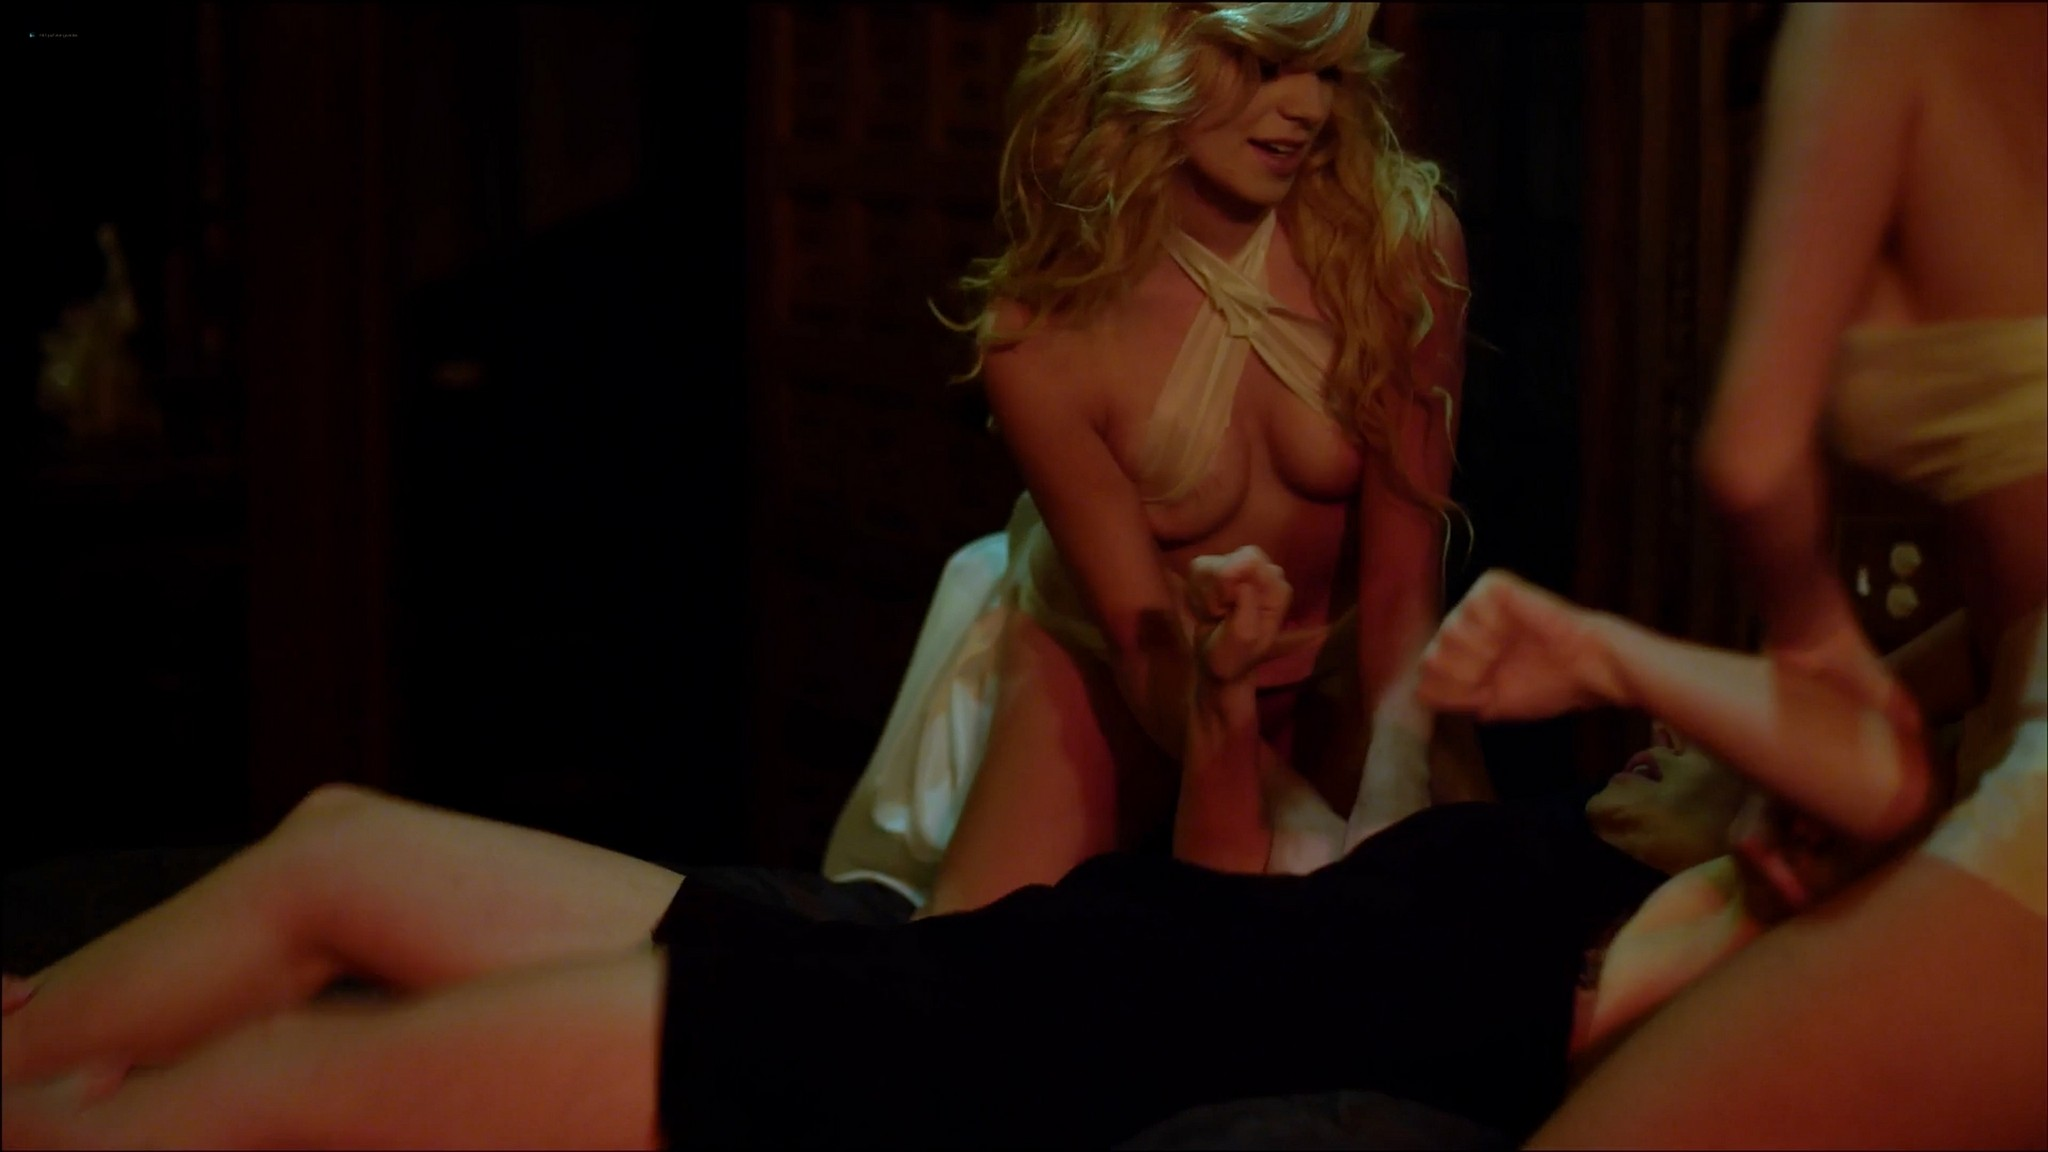 Mindy Robinson see through Christina Collard nude Dracula The Impaler 2013 1080p BluRay 12